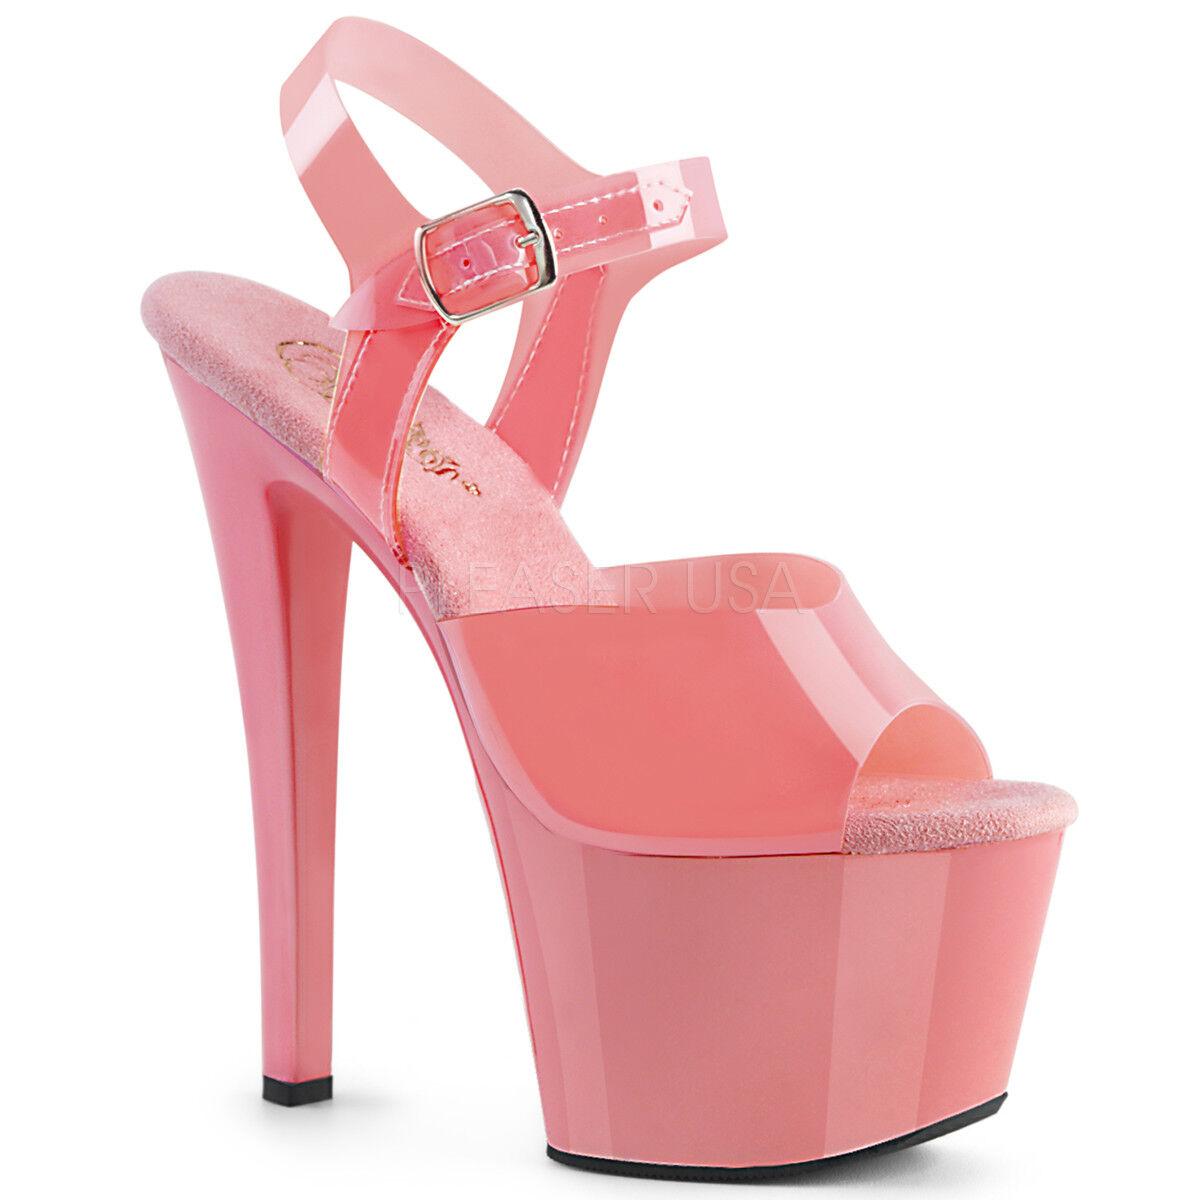 il più economico Pleaser SKY-308N Donna  Baby rosa Jelly-Like TPU TPU TPU Open Toe Platform Strap Sandal  acquista online oggi